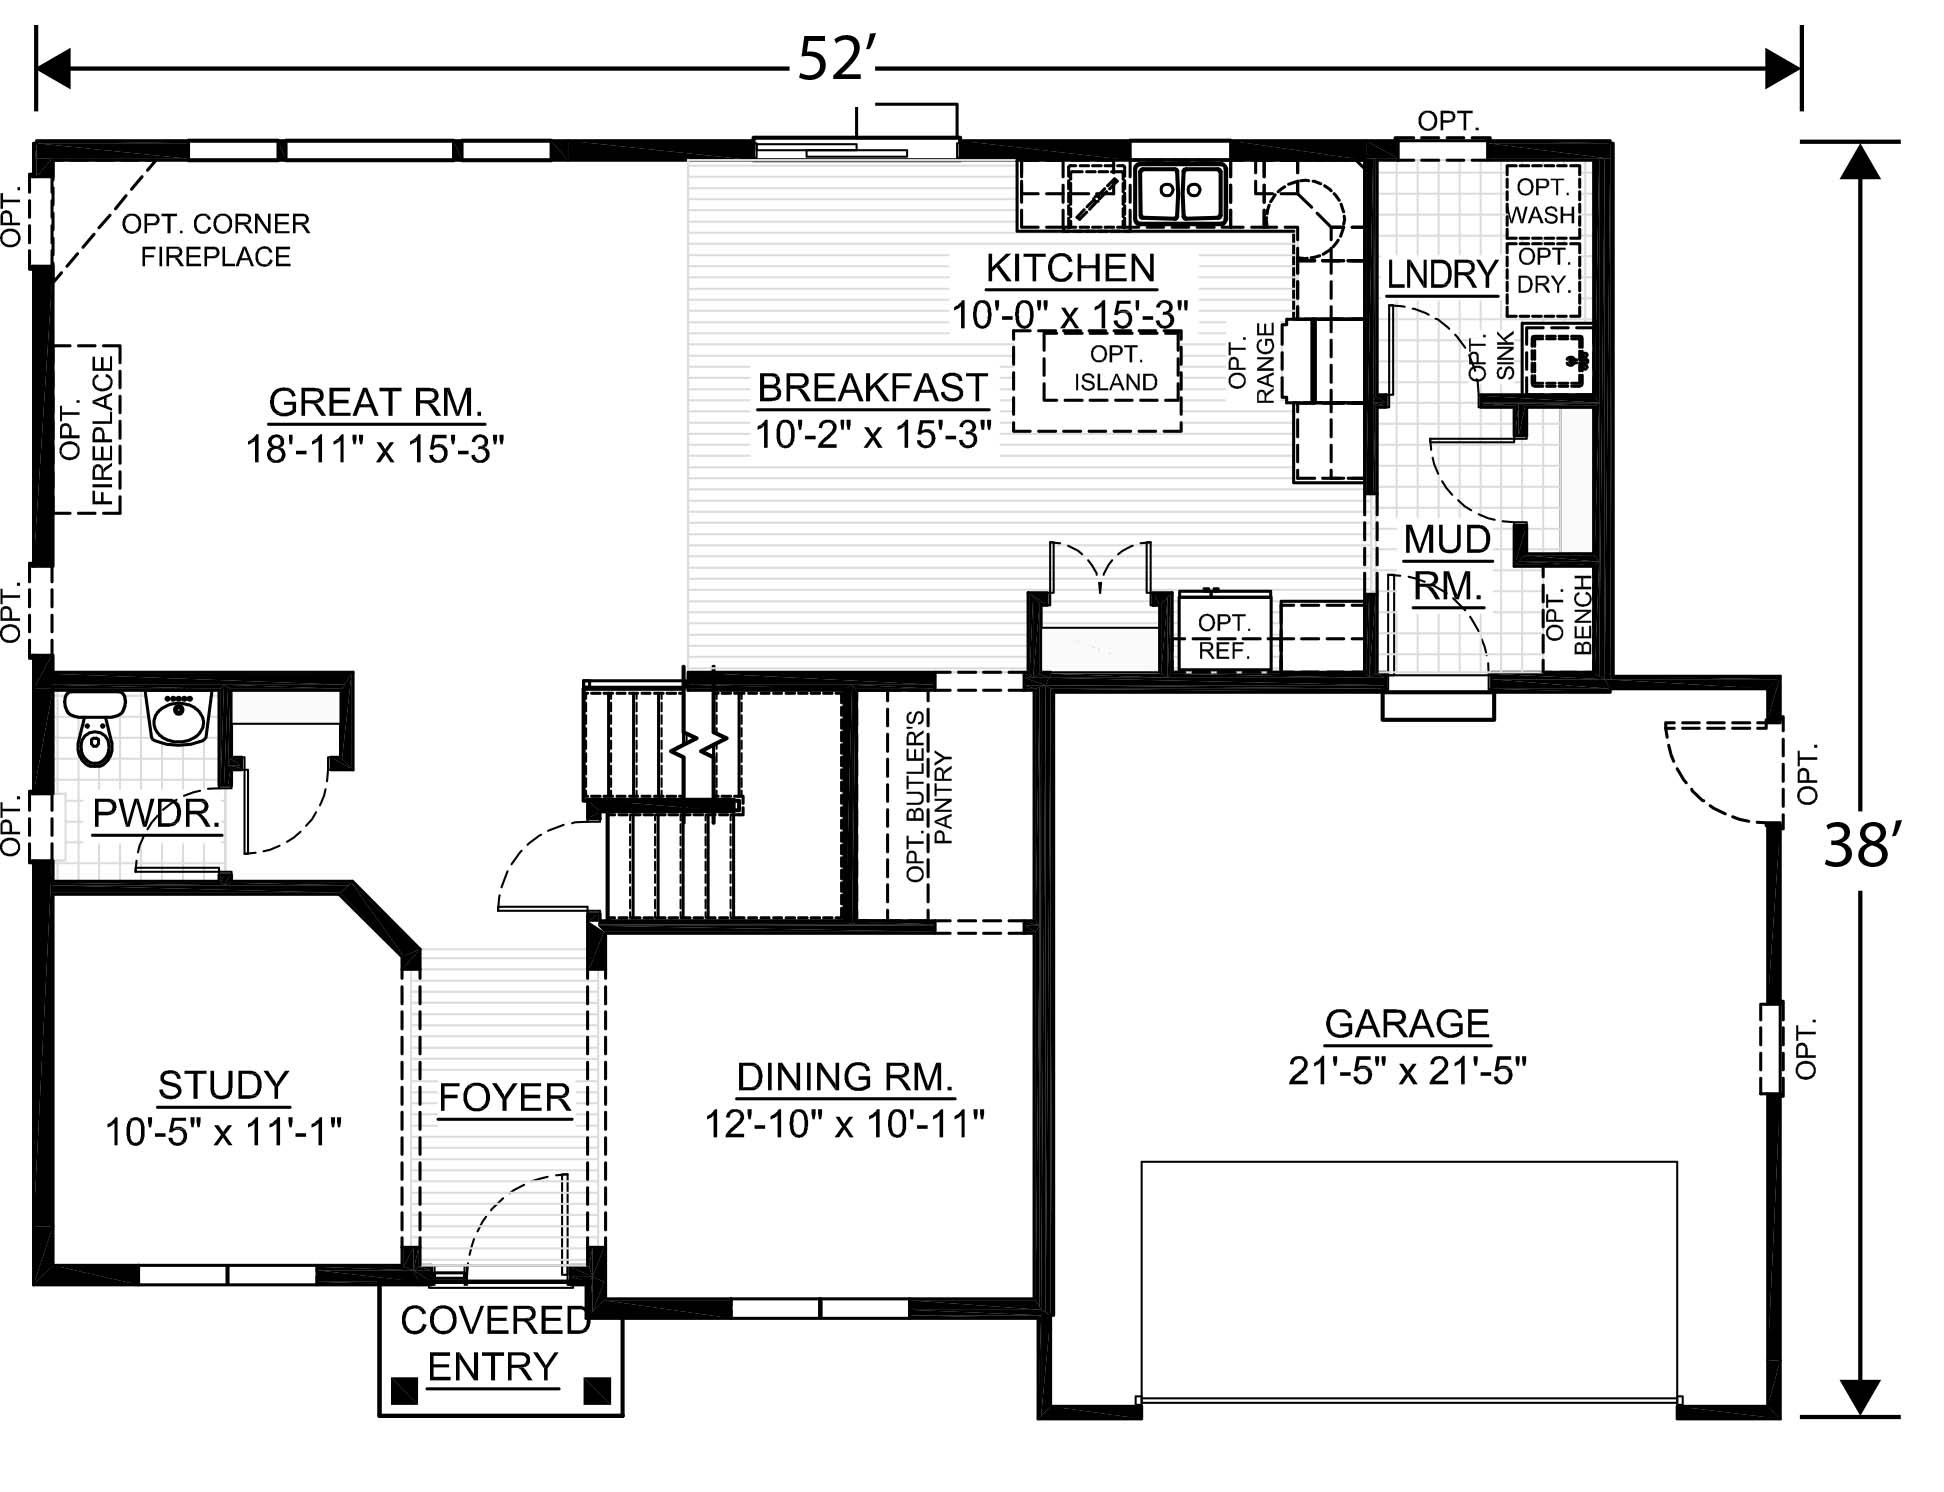 The Glenwood on edgewater house plans, whispering pines house plans, boca raton house plans, little river house plans, new york house plans, bartram springs house plans, ocean house plans,